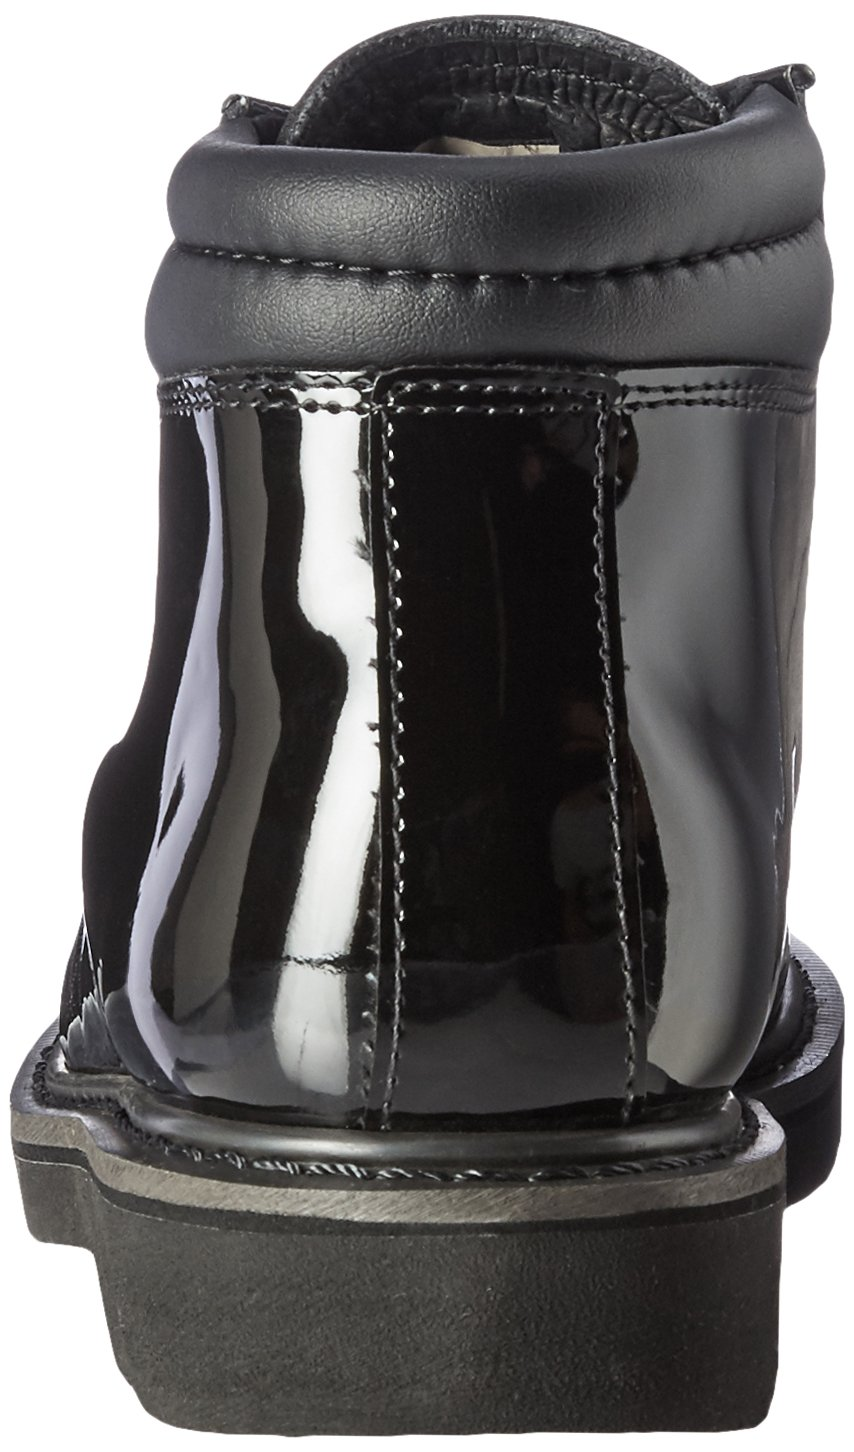 Rocky Men's 6 Inch Professional Dress 500-8 Work Boot,Black,10 XW US by Rocky (Image #2)